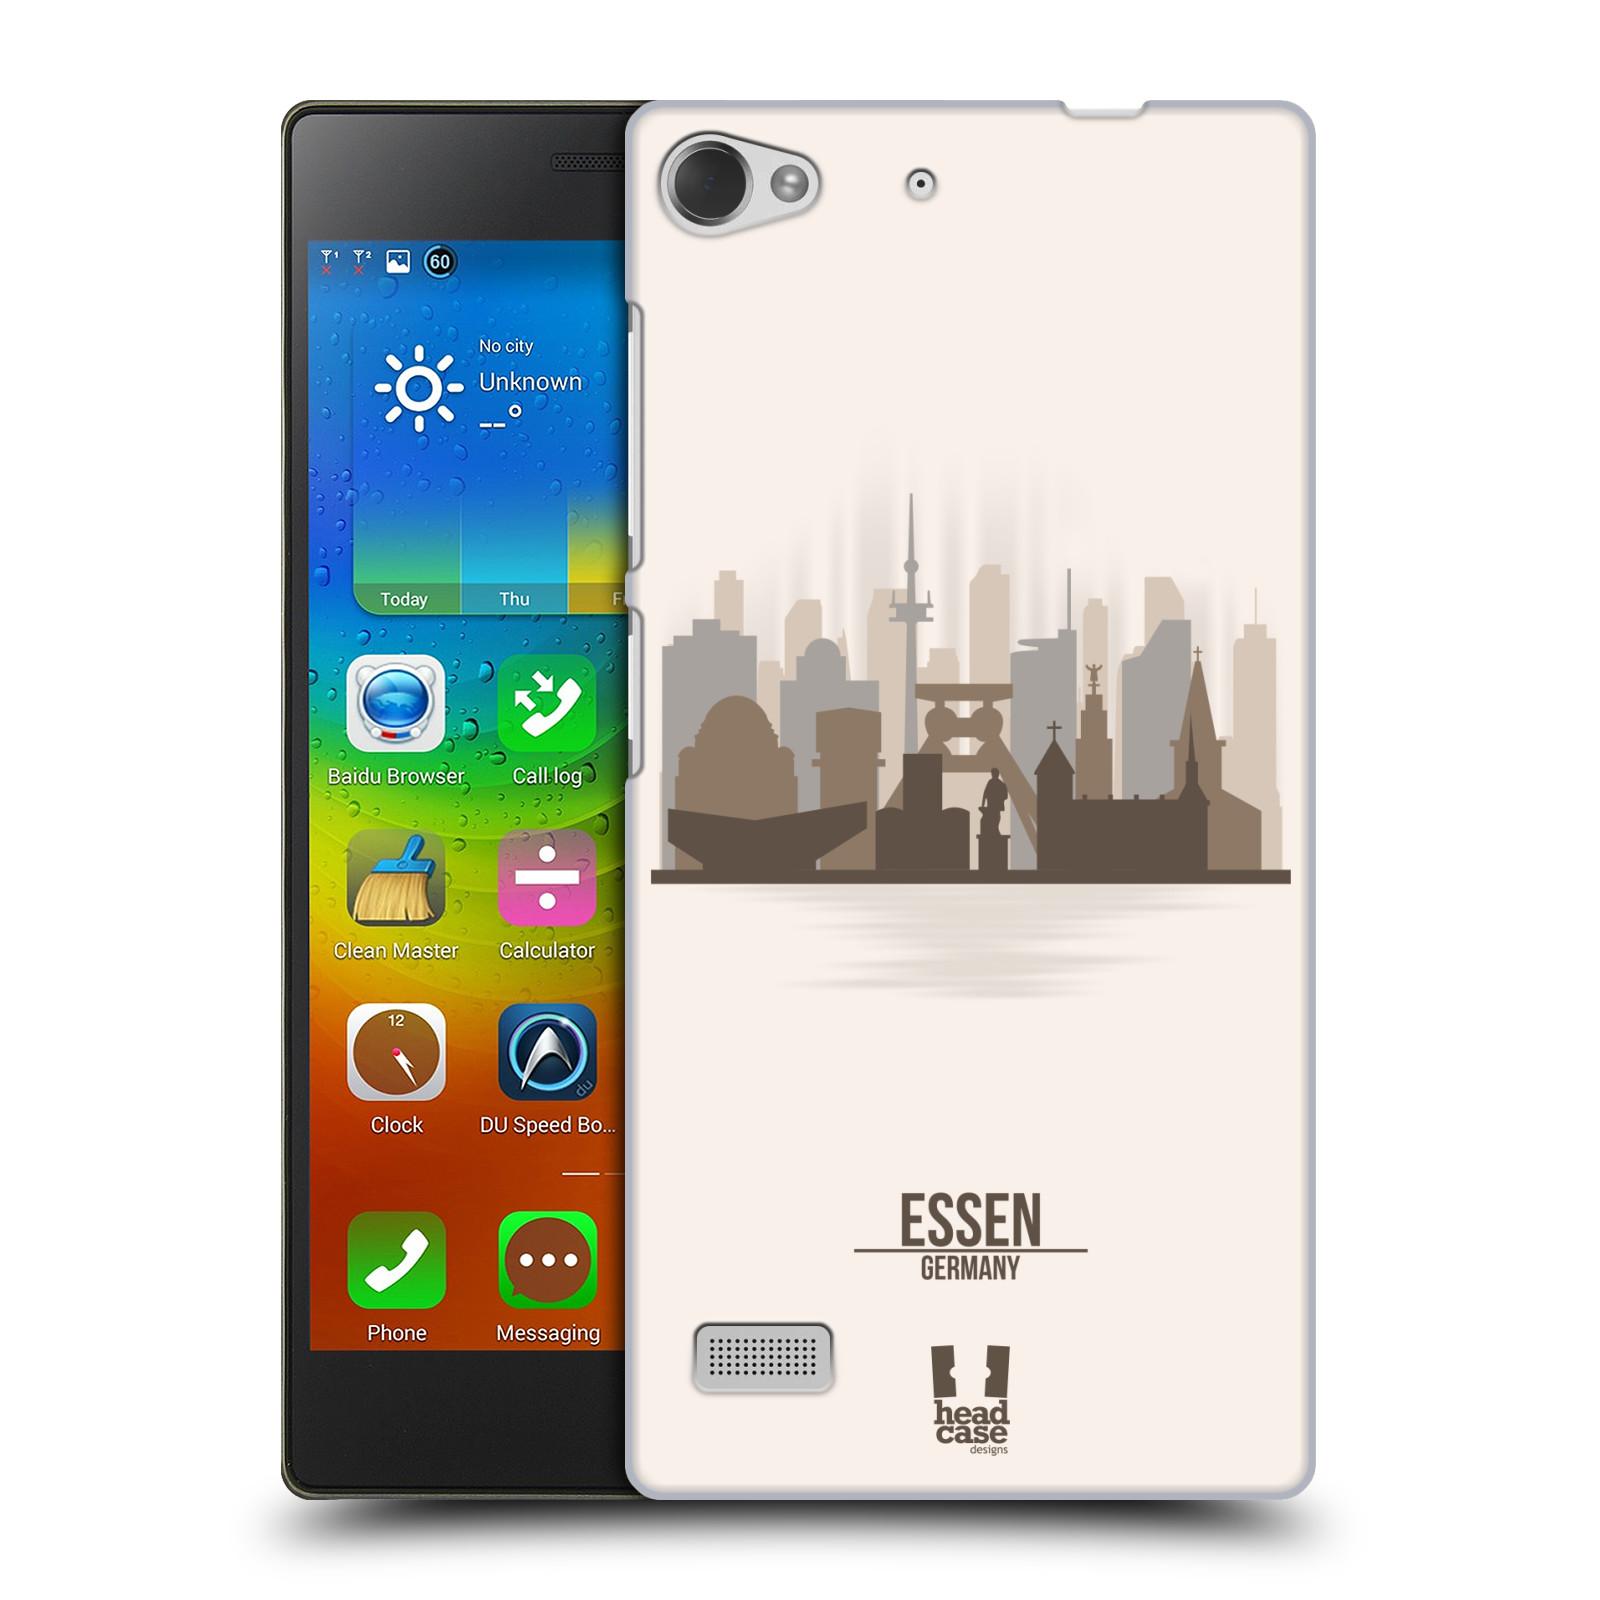 HEAD-CASE-DESIGNS-CITY-SKYLINES-GERMANY-HARD-BACK-CASE-FOR-LENOVO-PHONES